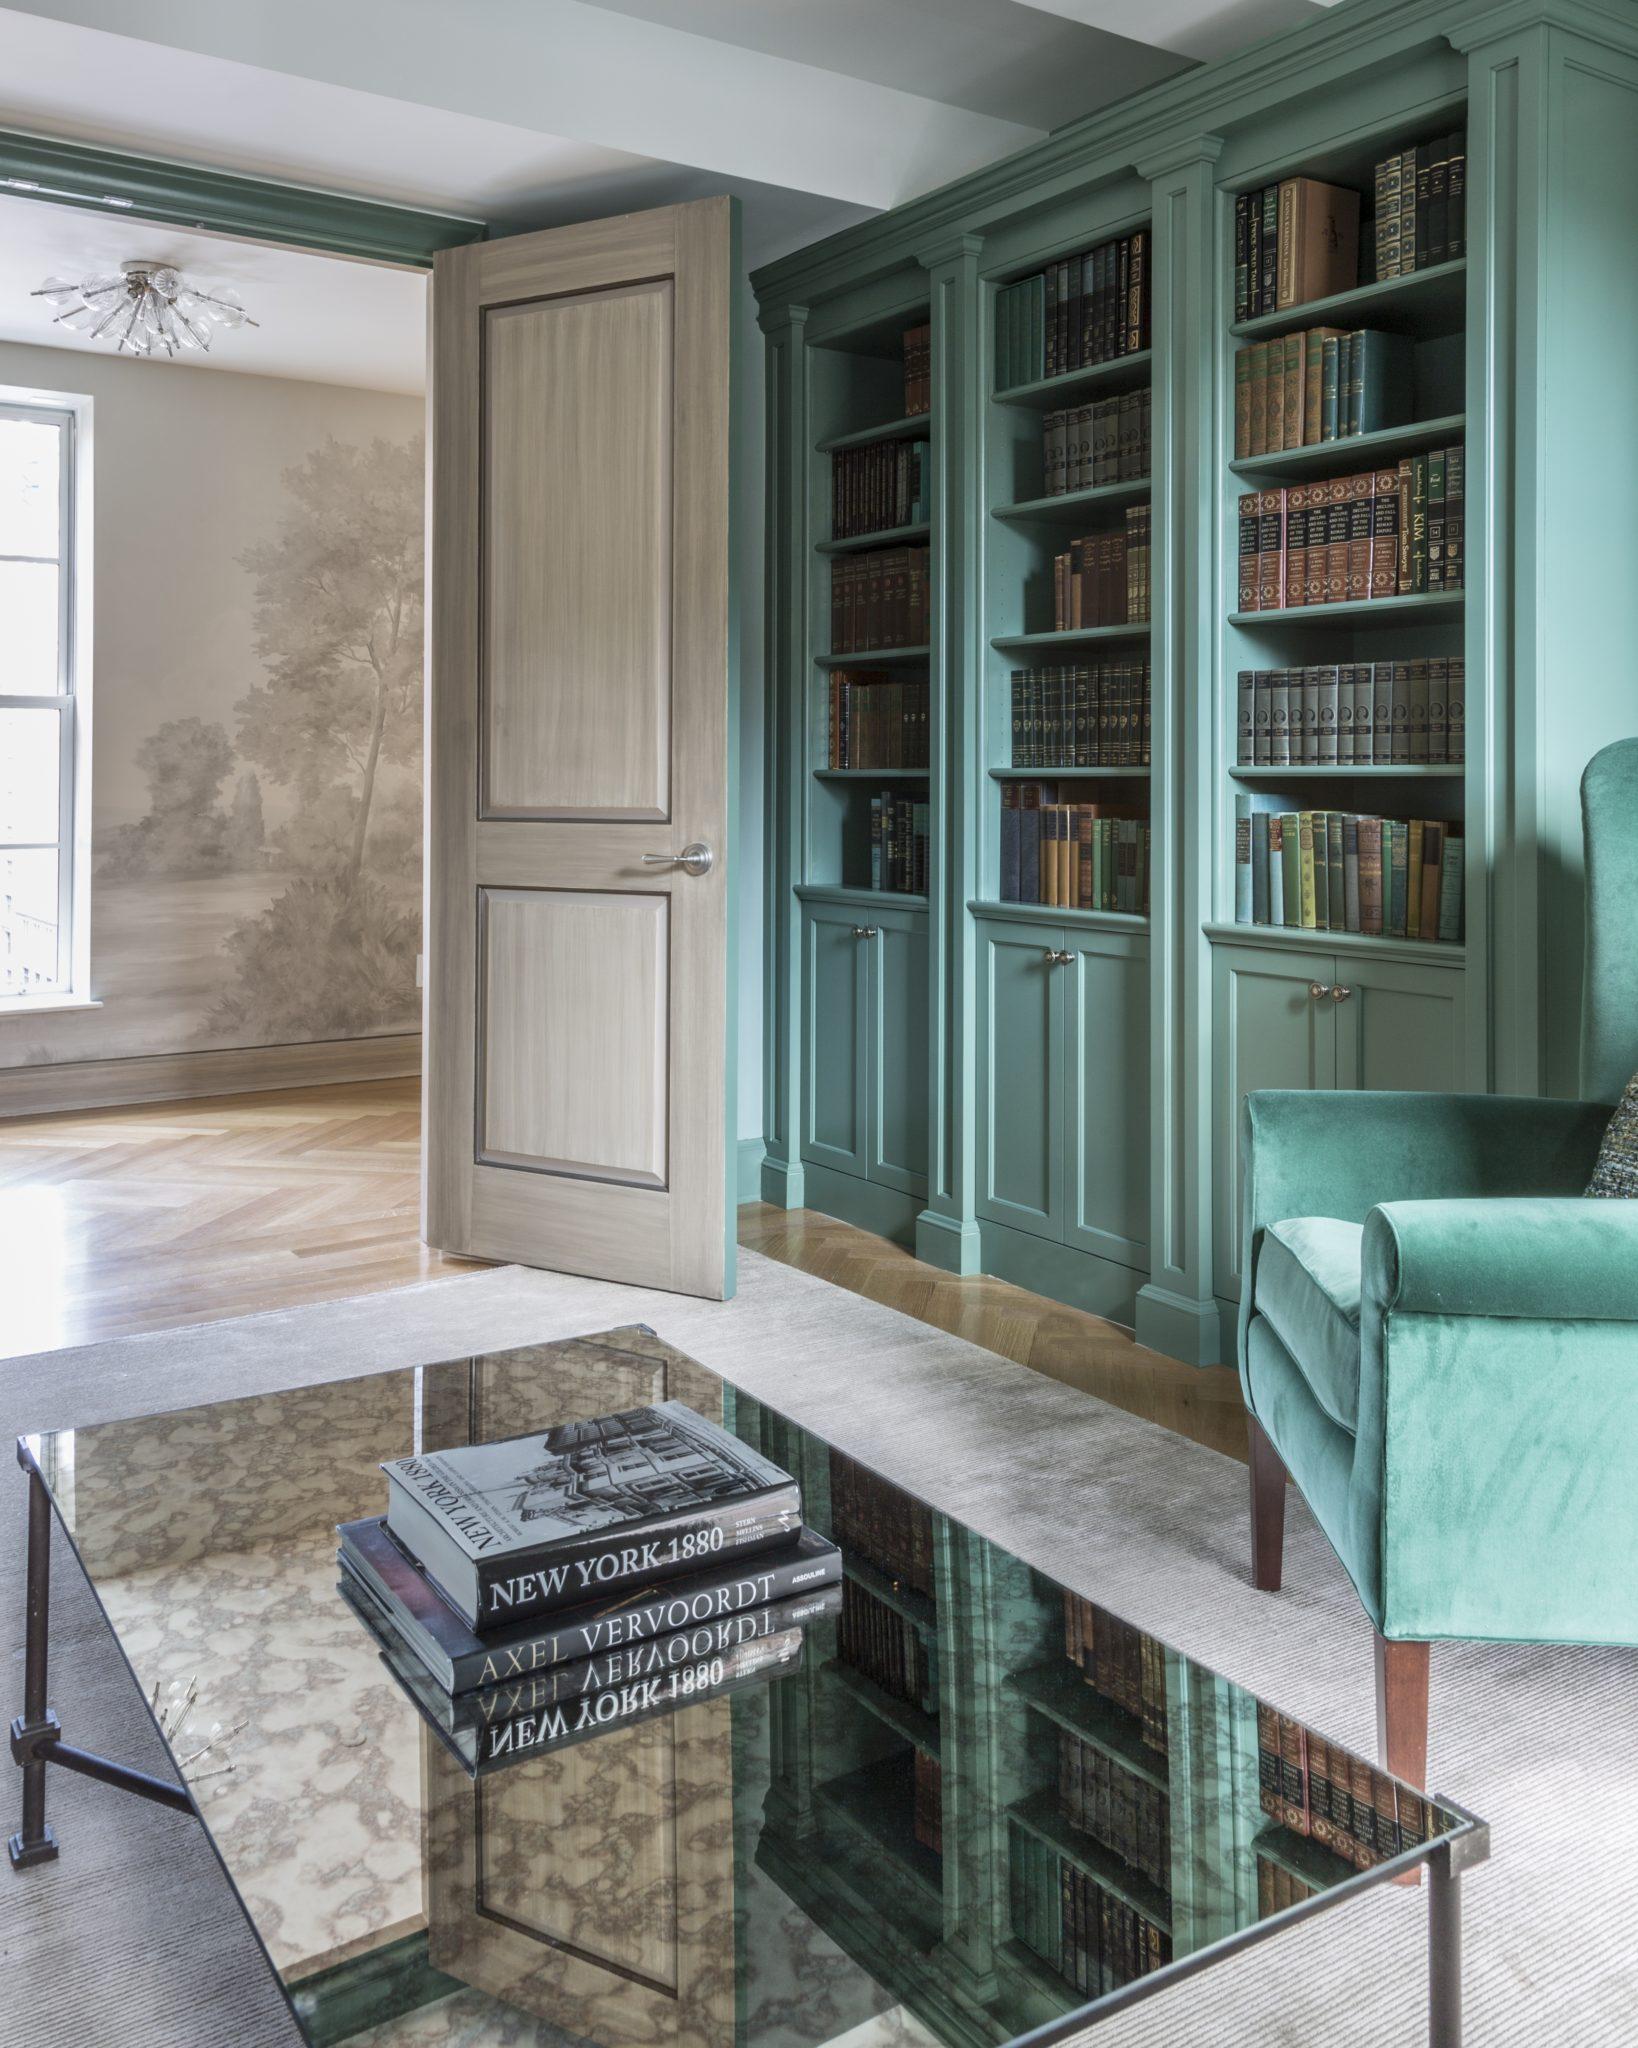 Interior design by Bennett Leifer Interiors